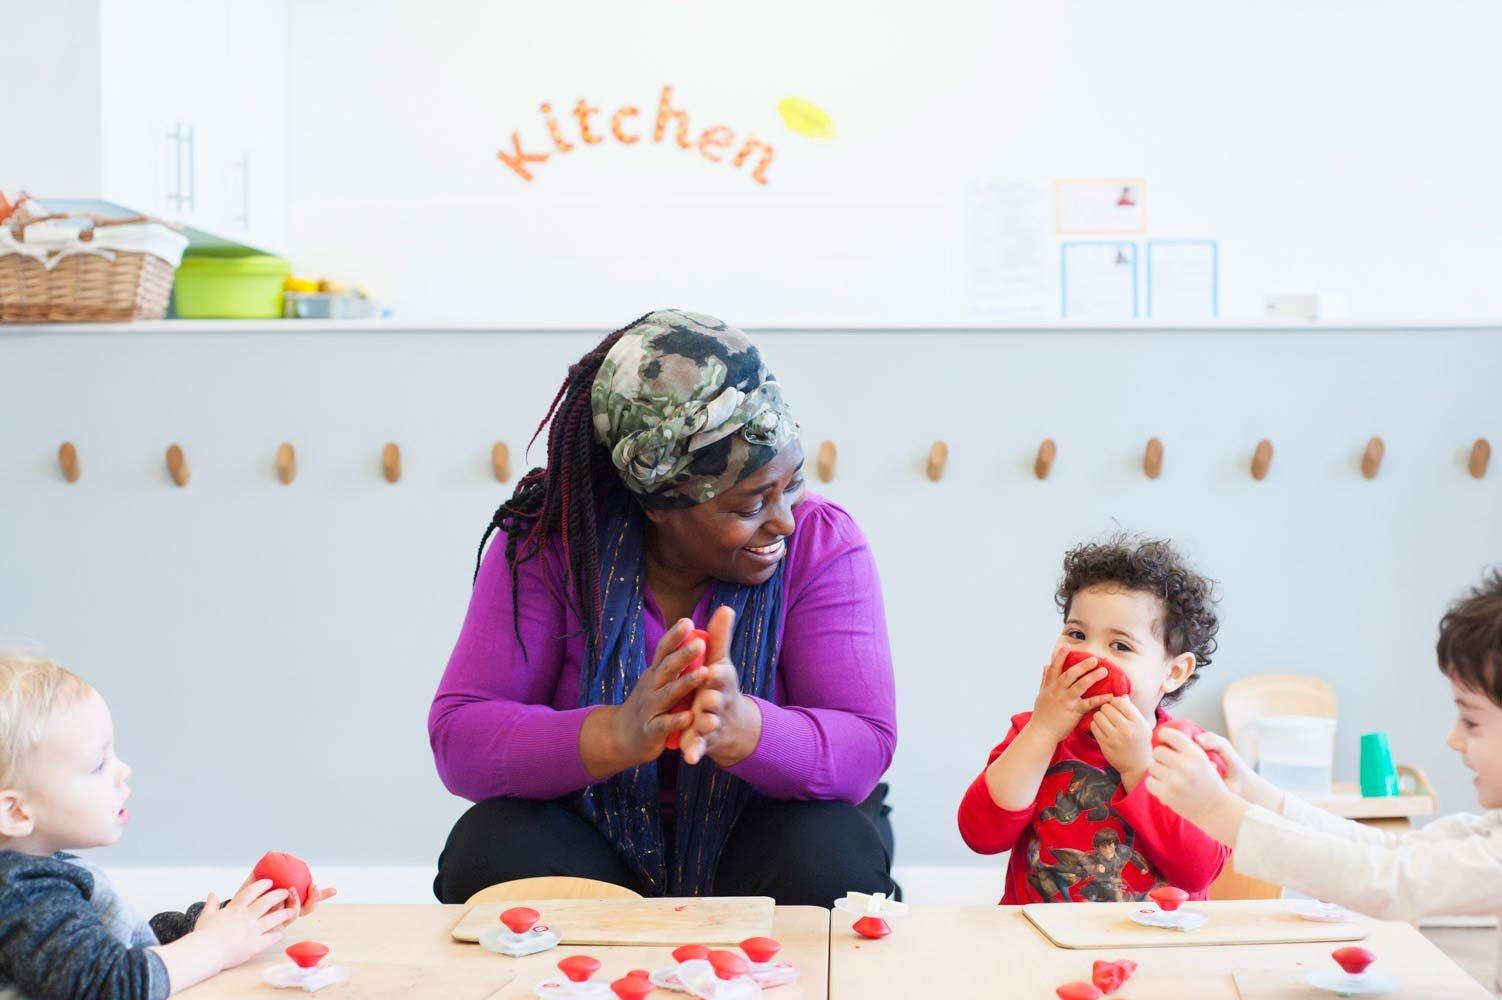 Image of nursery school children and smiling teacher